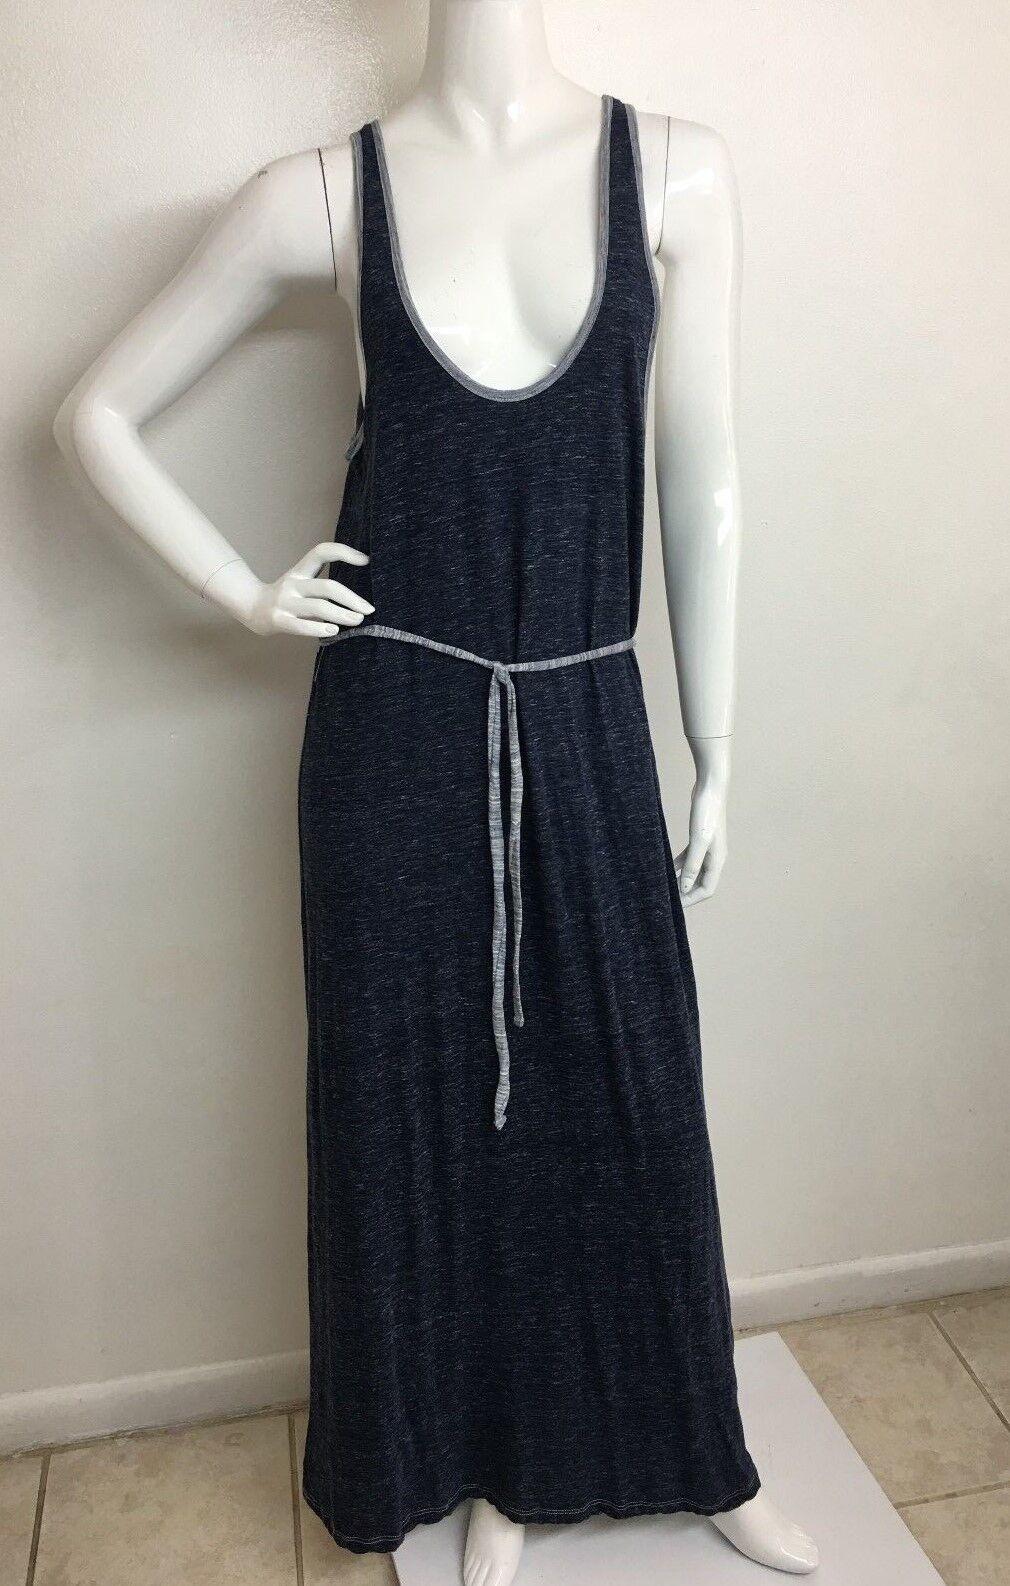 SOFT soft . joie New Women's Dark Indigo Round N Sleeveless Printed Dress M NWT